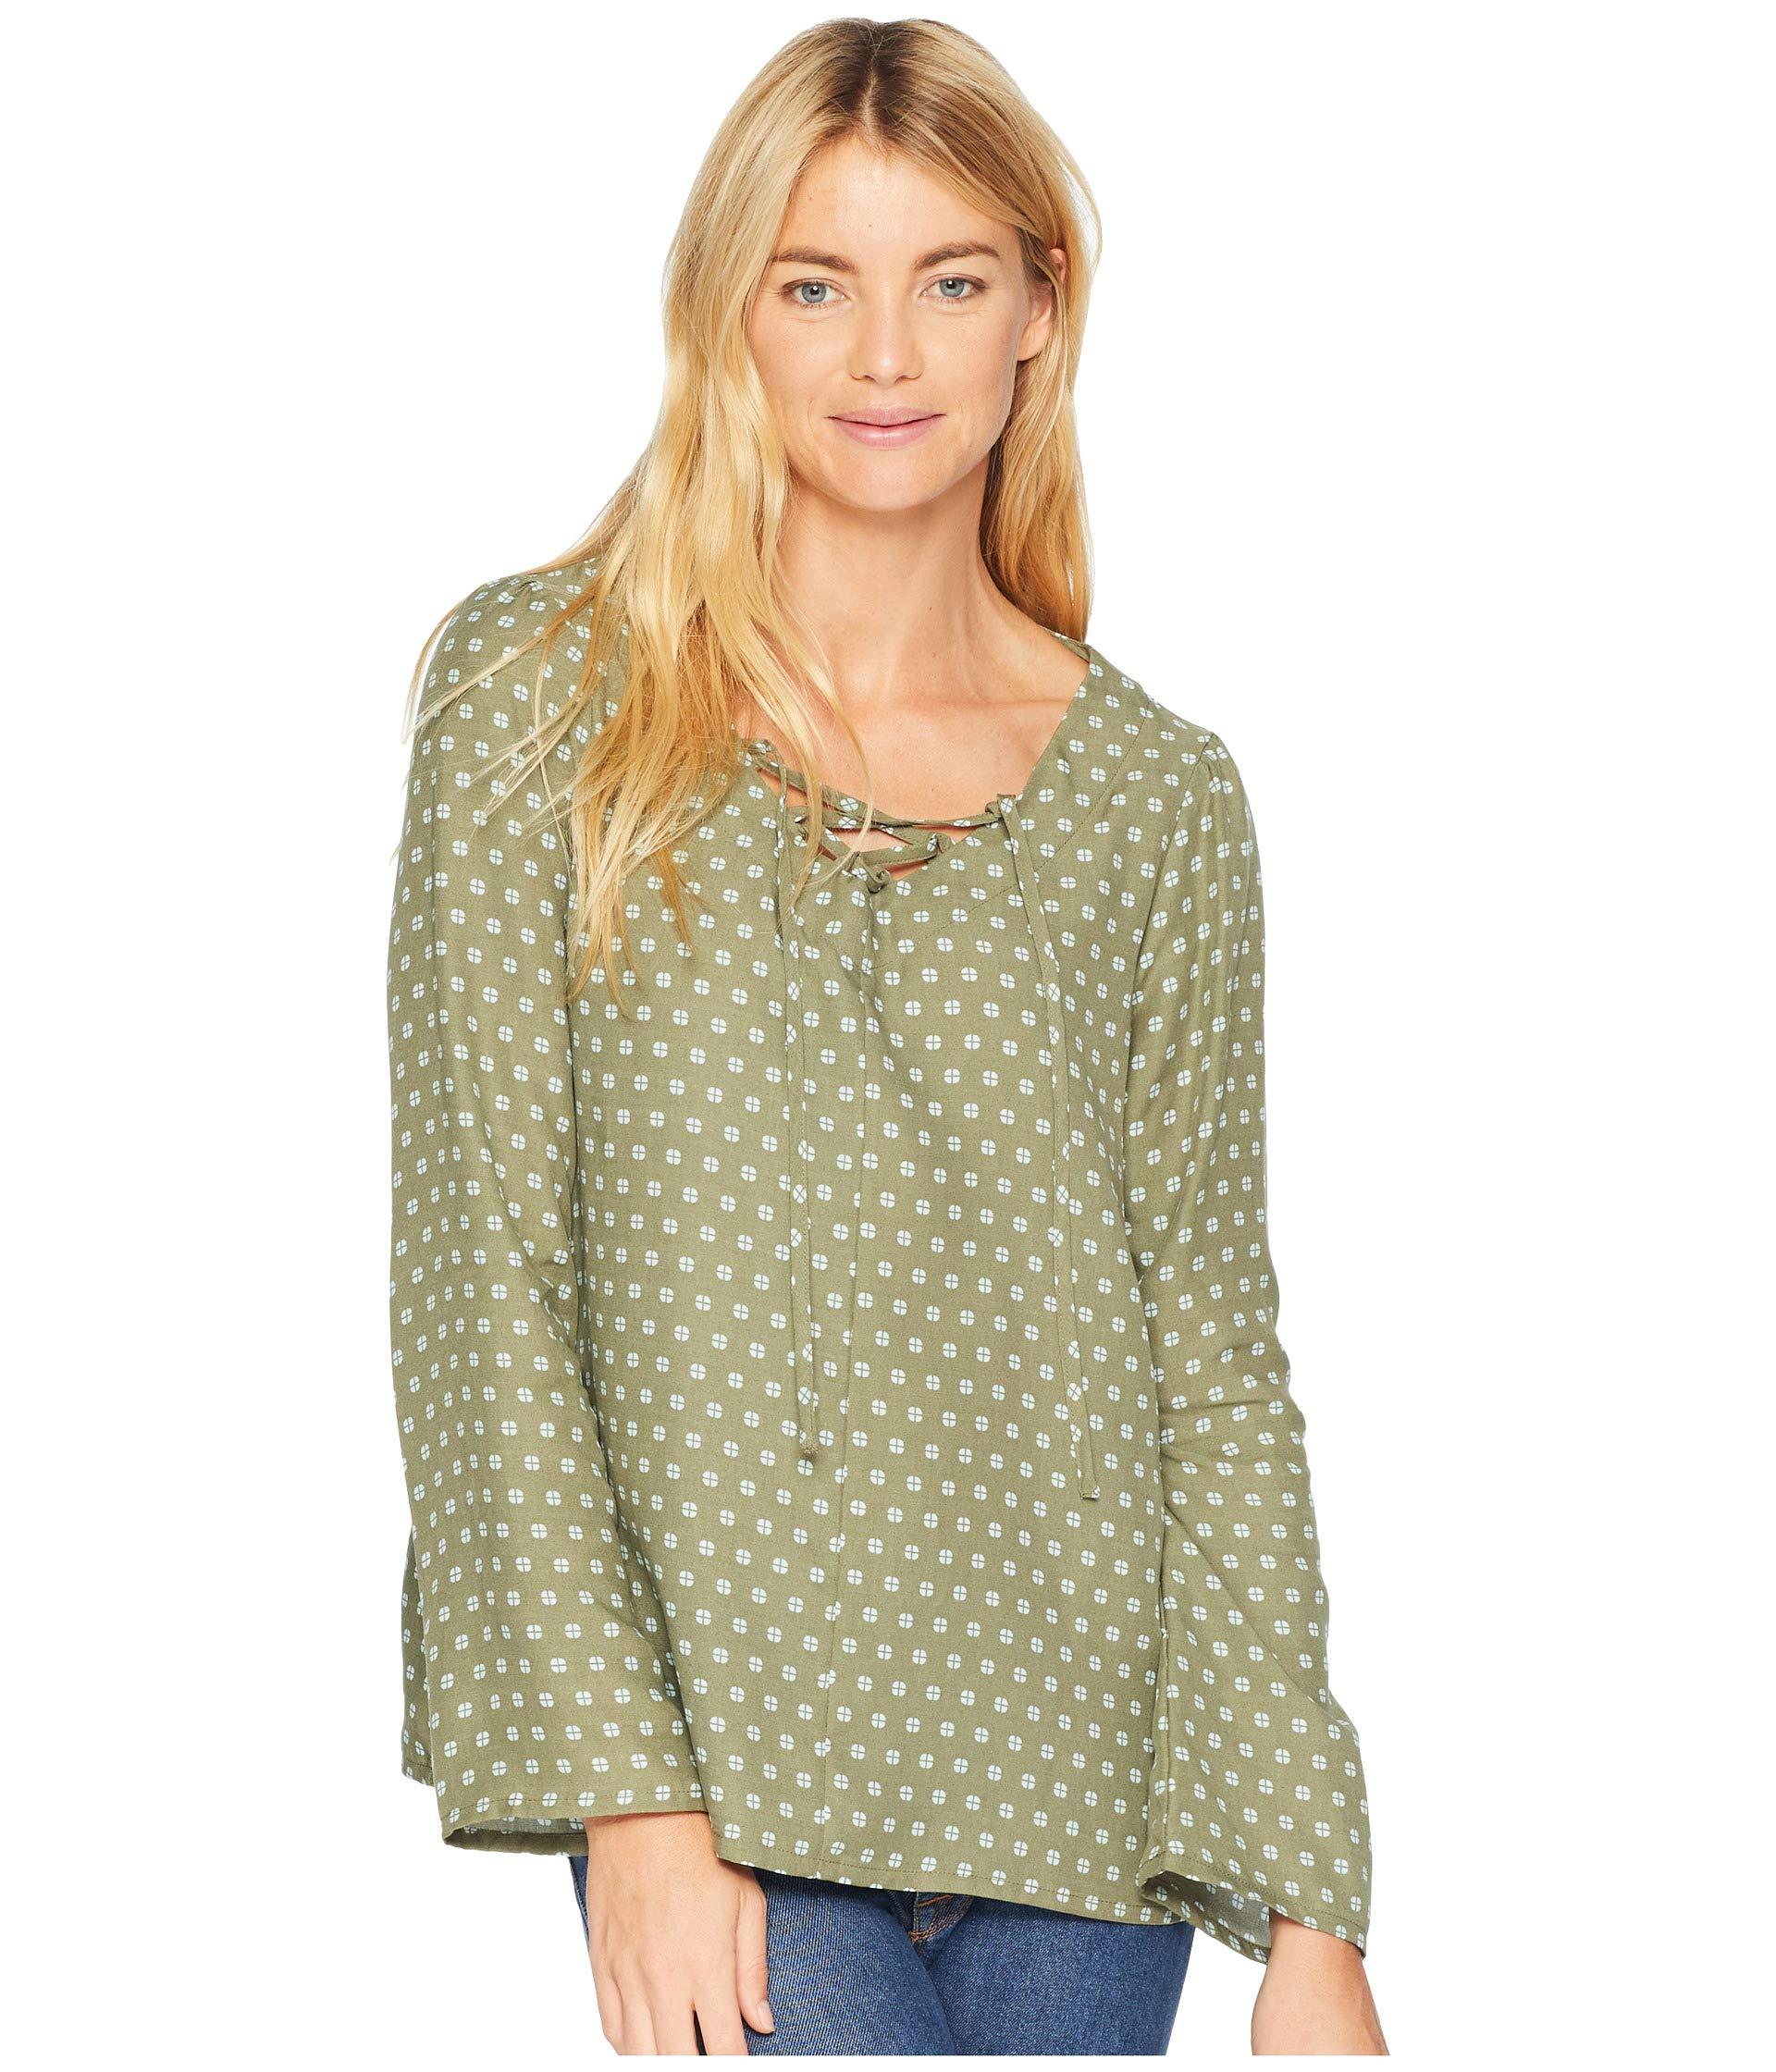 Toad Hillrose Sleeve Mod Shirt Dot Rustic amp;co Olive Long Print UTURF